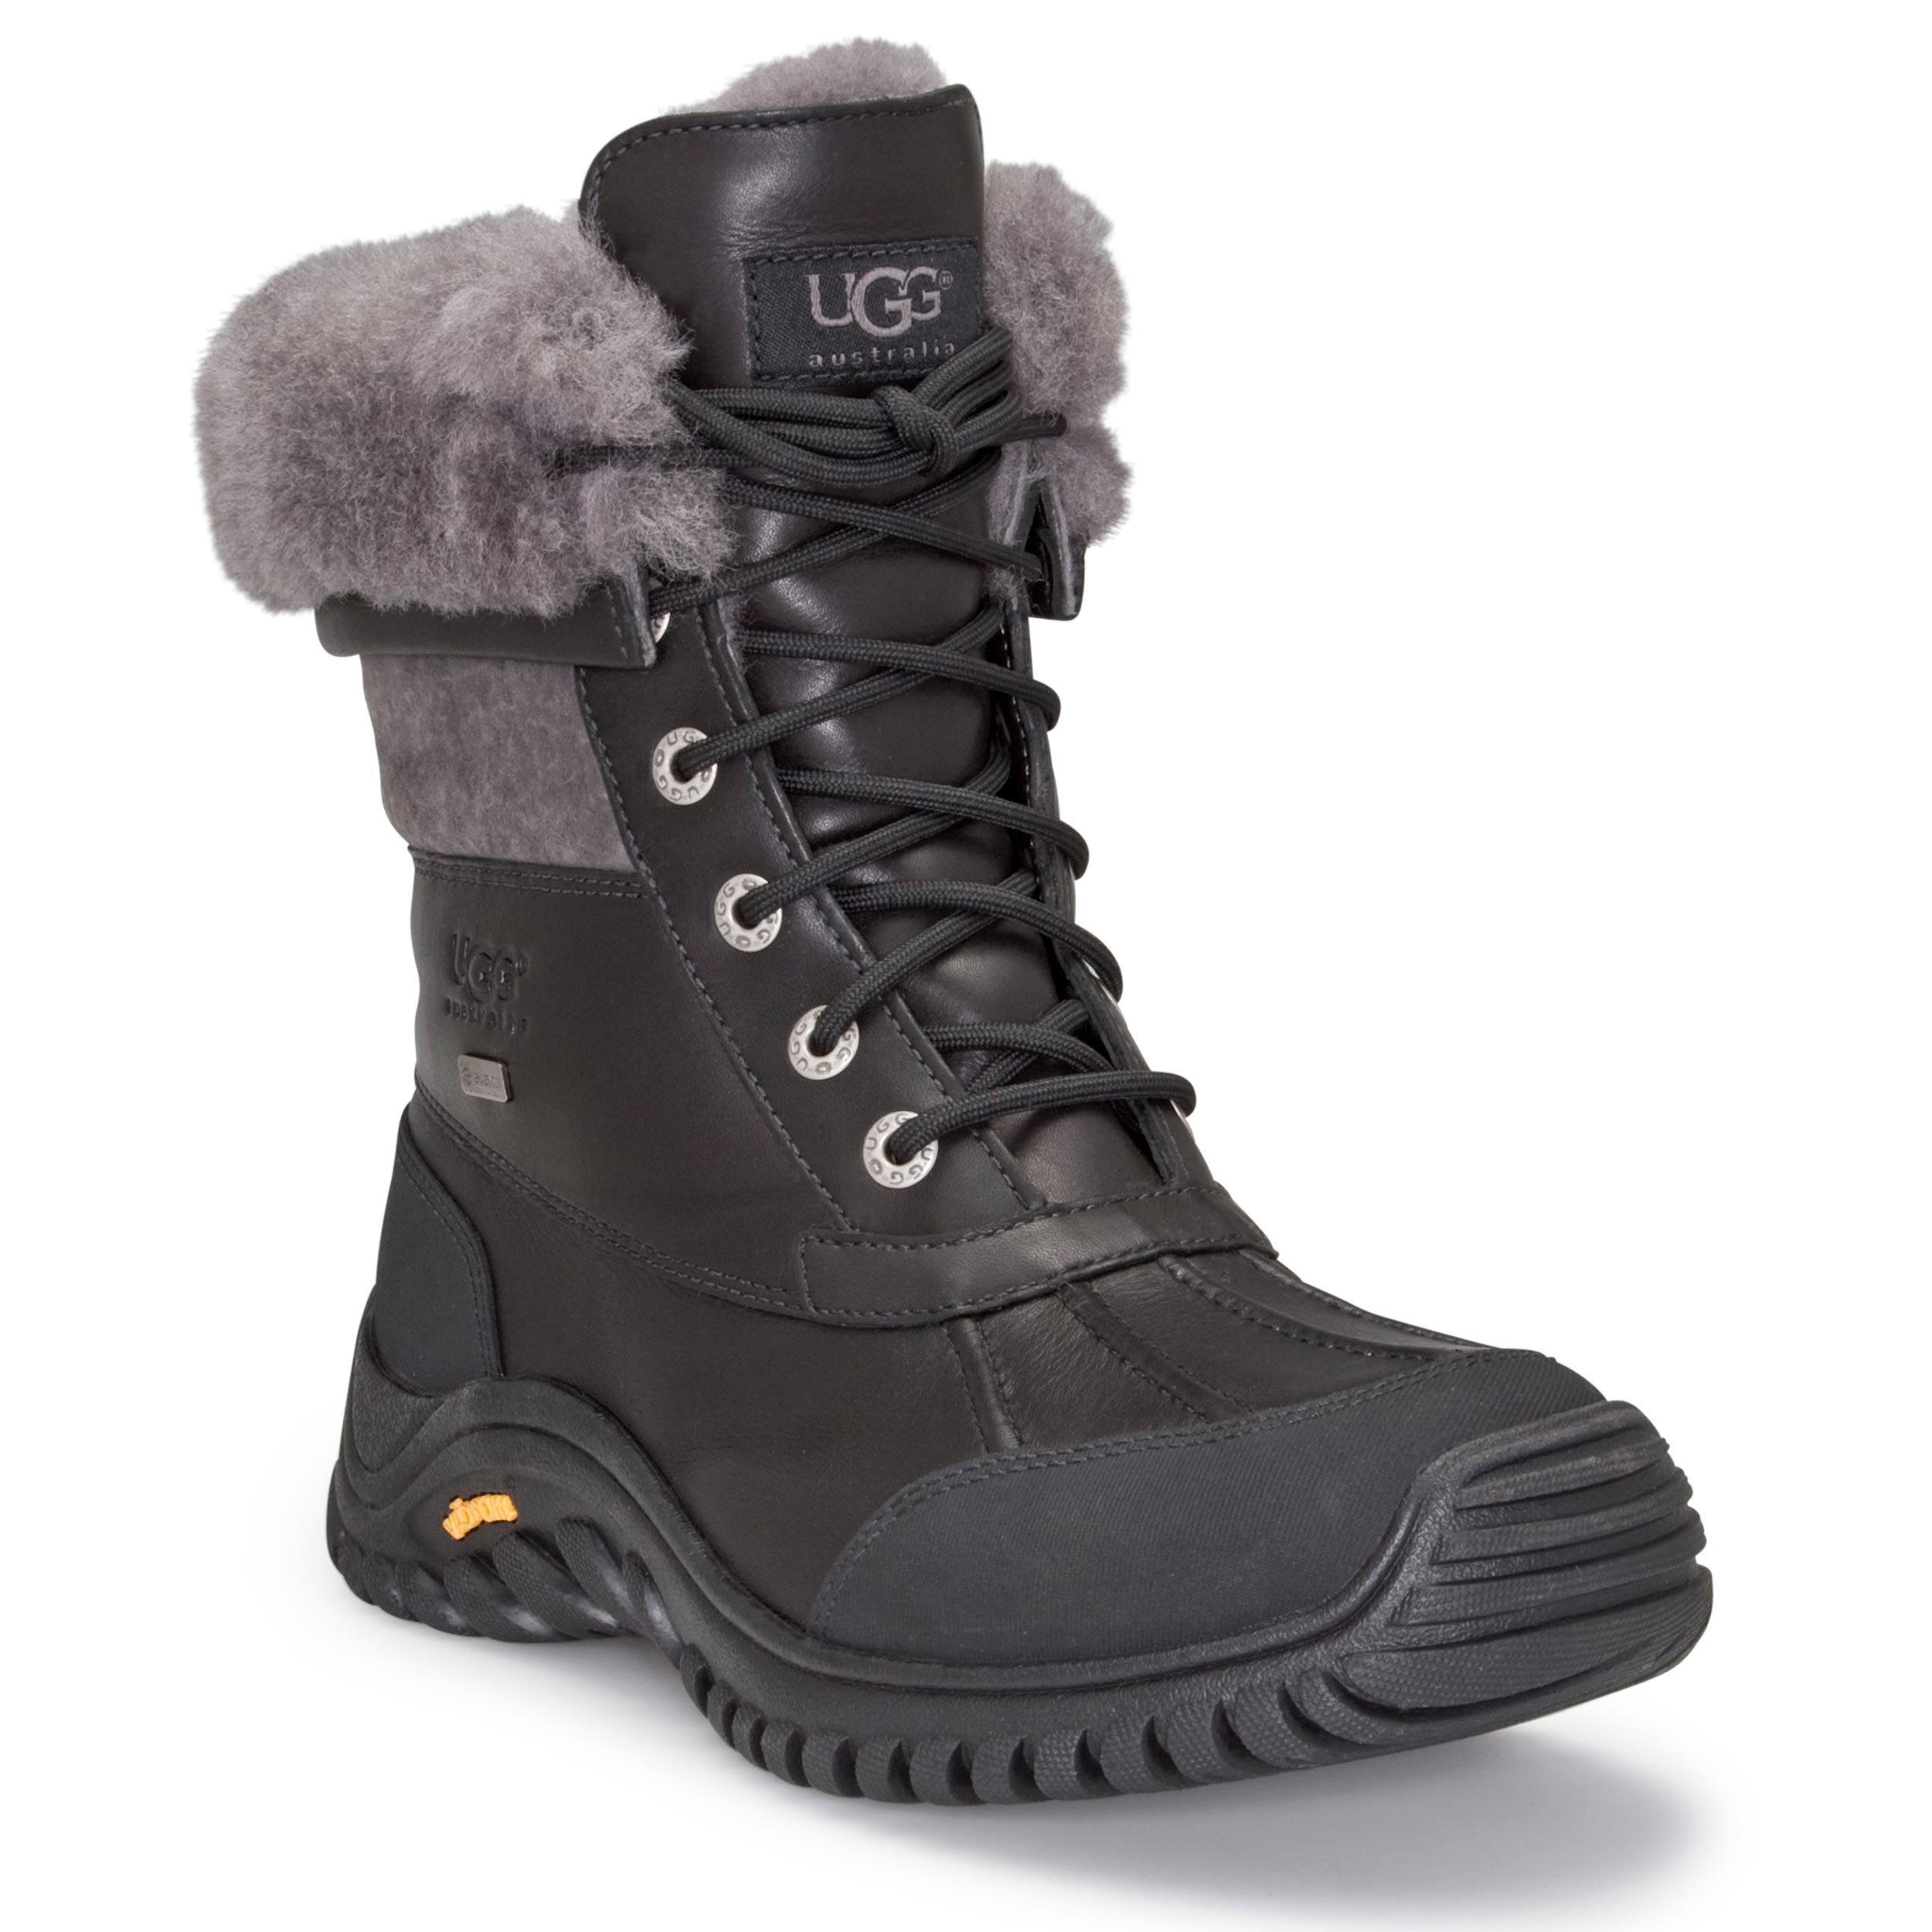 UGG Women's Adirondack II Winter Boot, Black/Grey, 6 B US